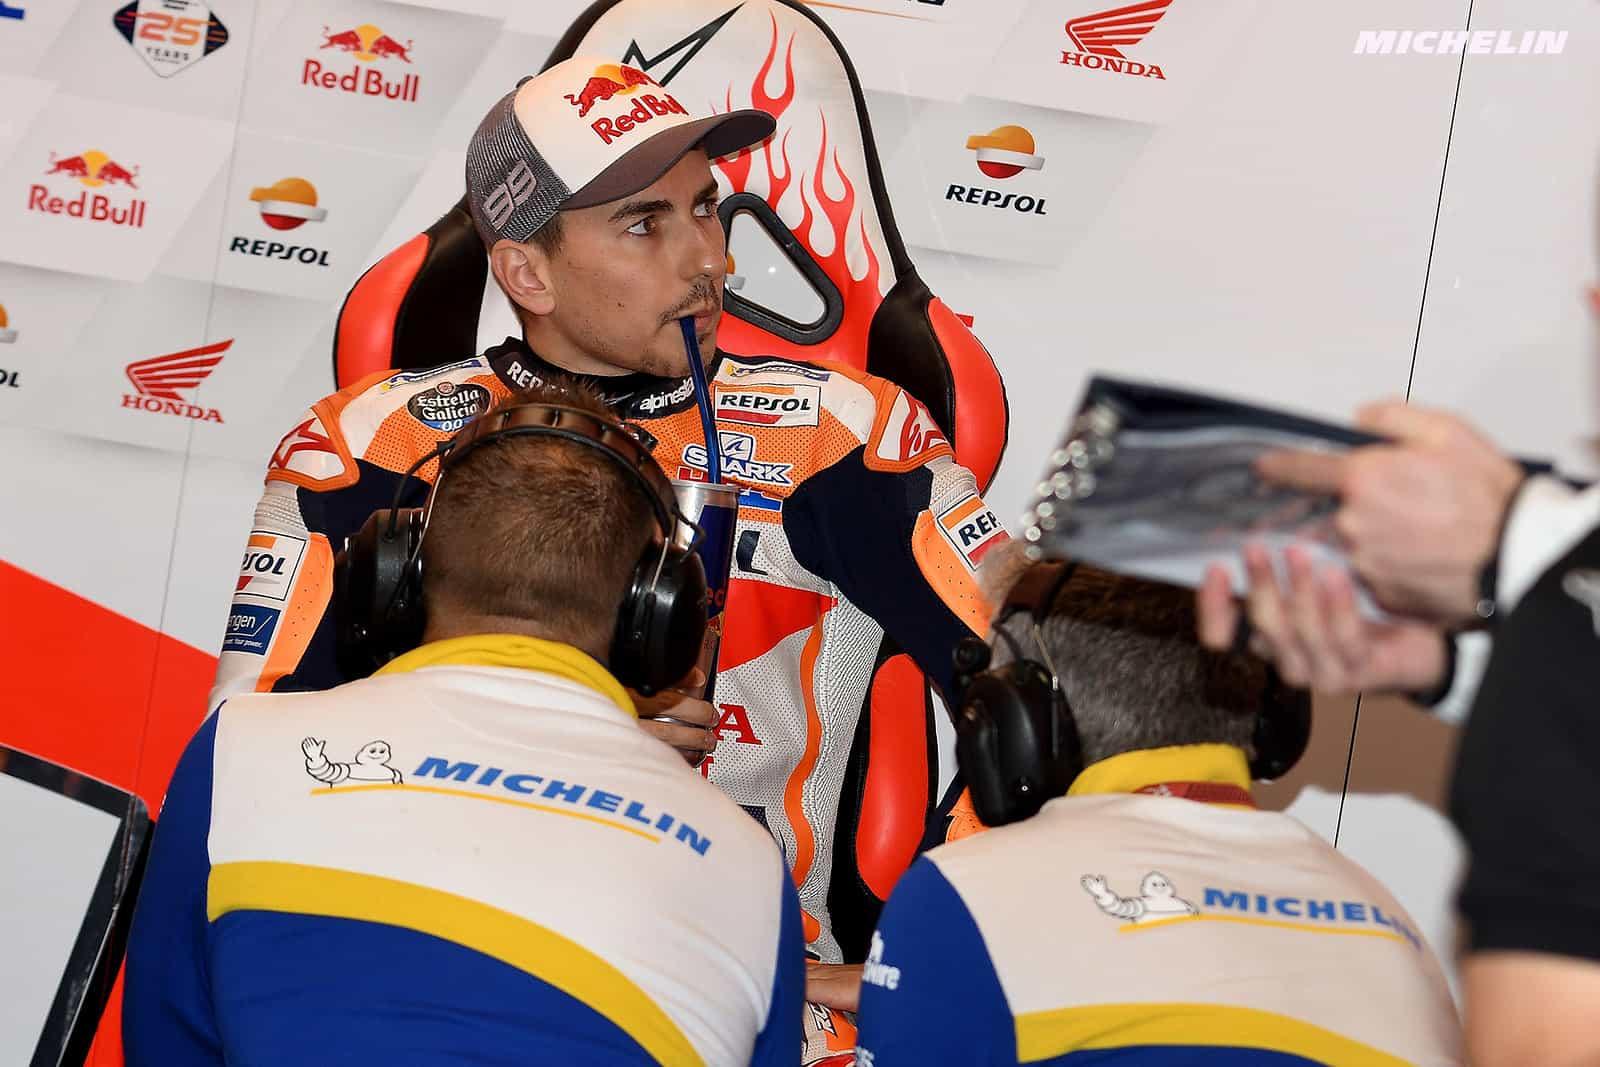 MotoGP2019オーストラリアGP ロレンソ「フィジカル面、スピード、自信など全ての面で苦戦」